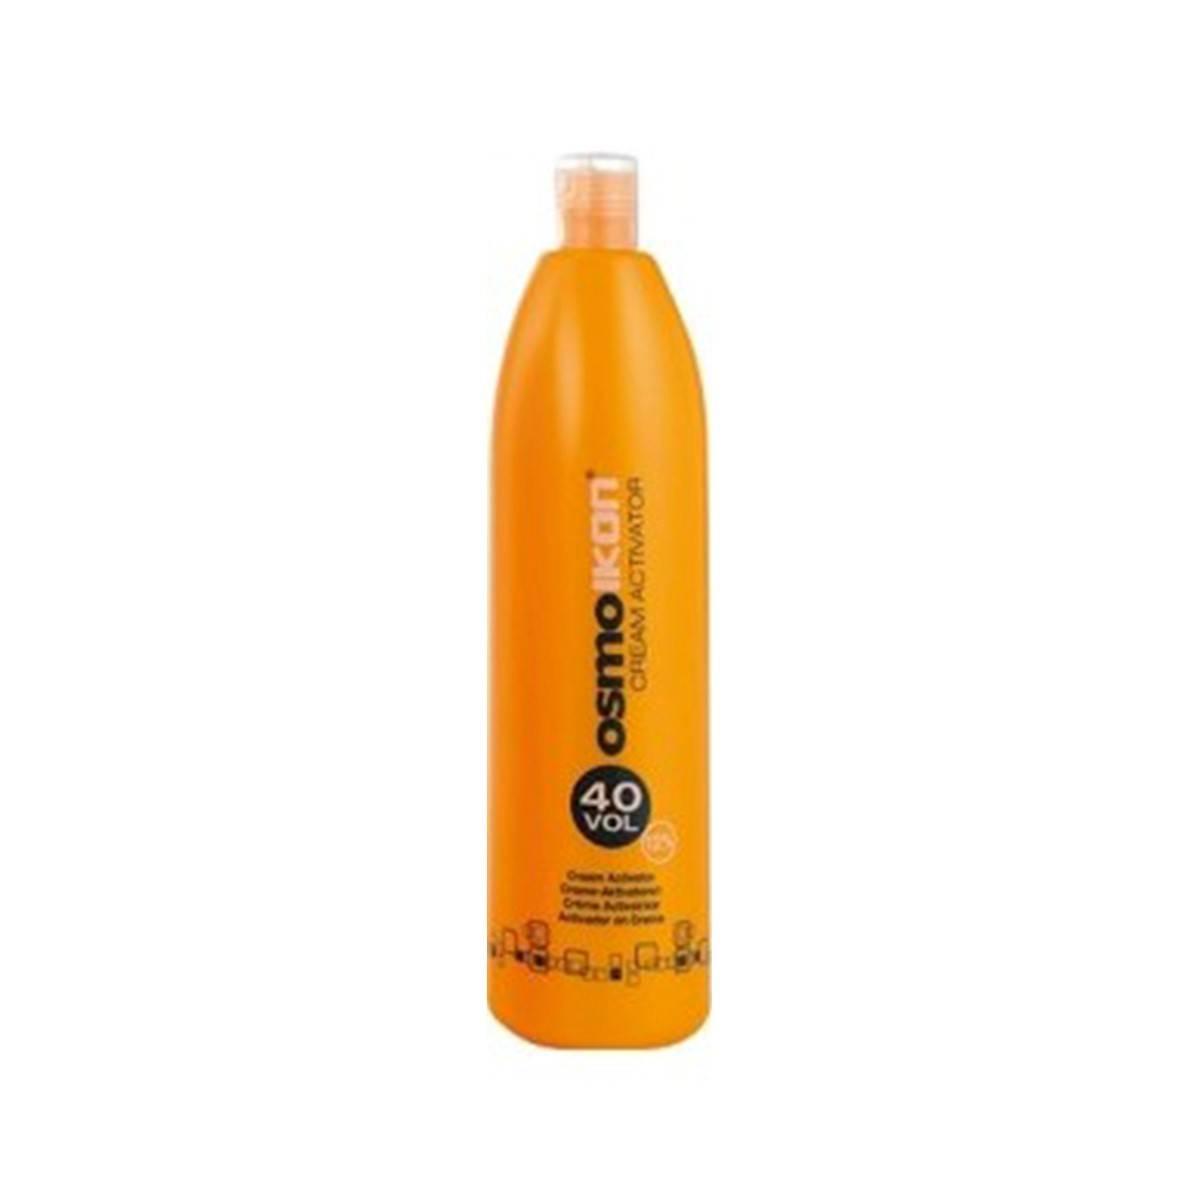 Osmo Ikon Cream Coact. 40 Vol Ossigeno 40 Vol